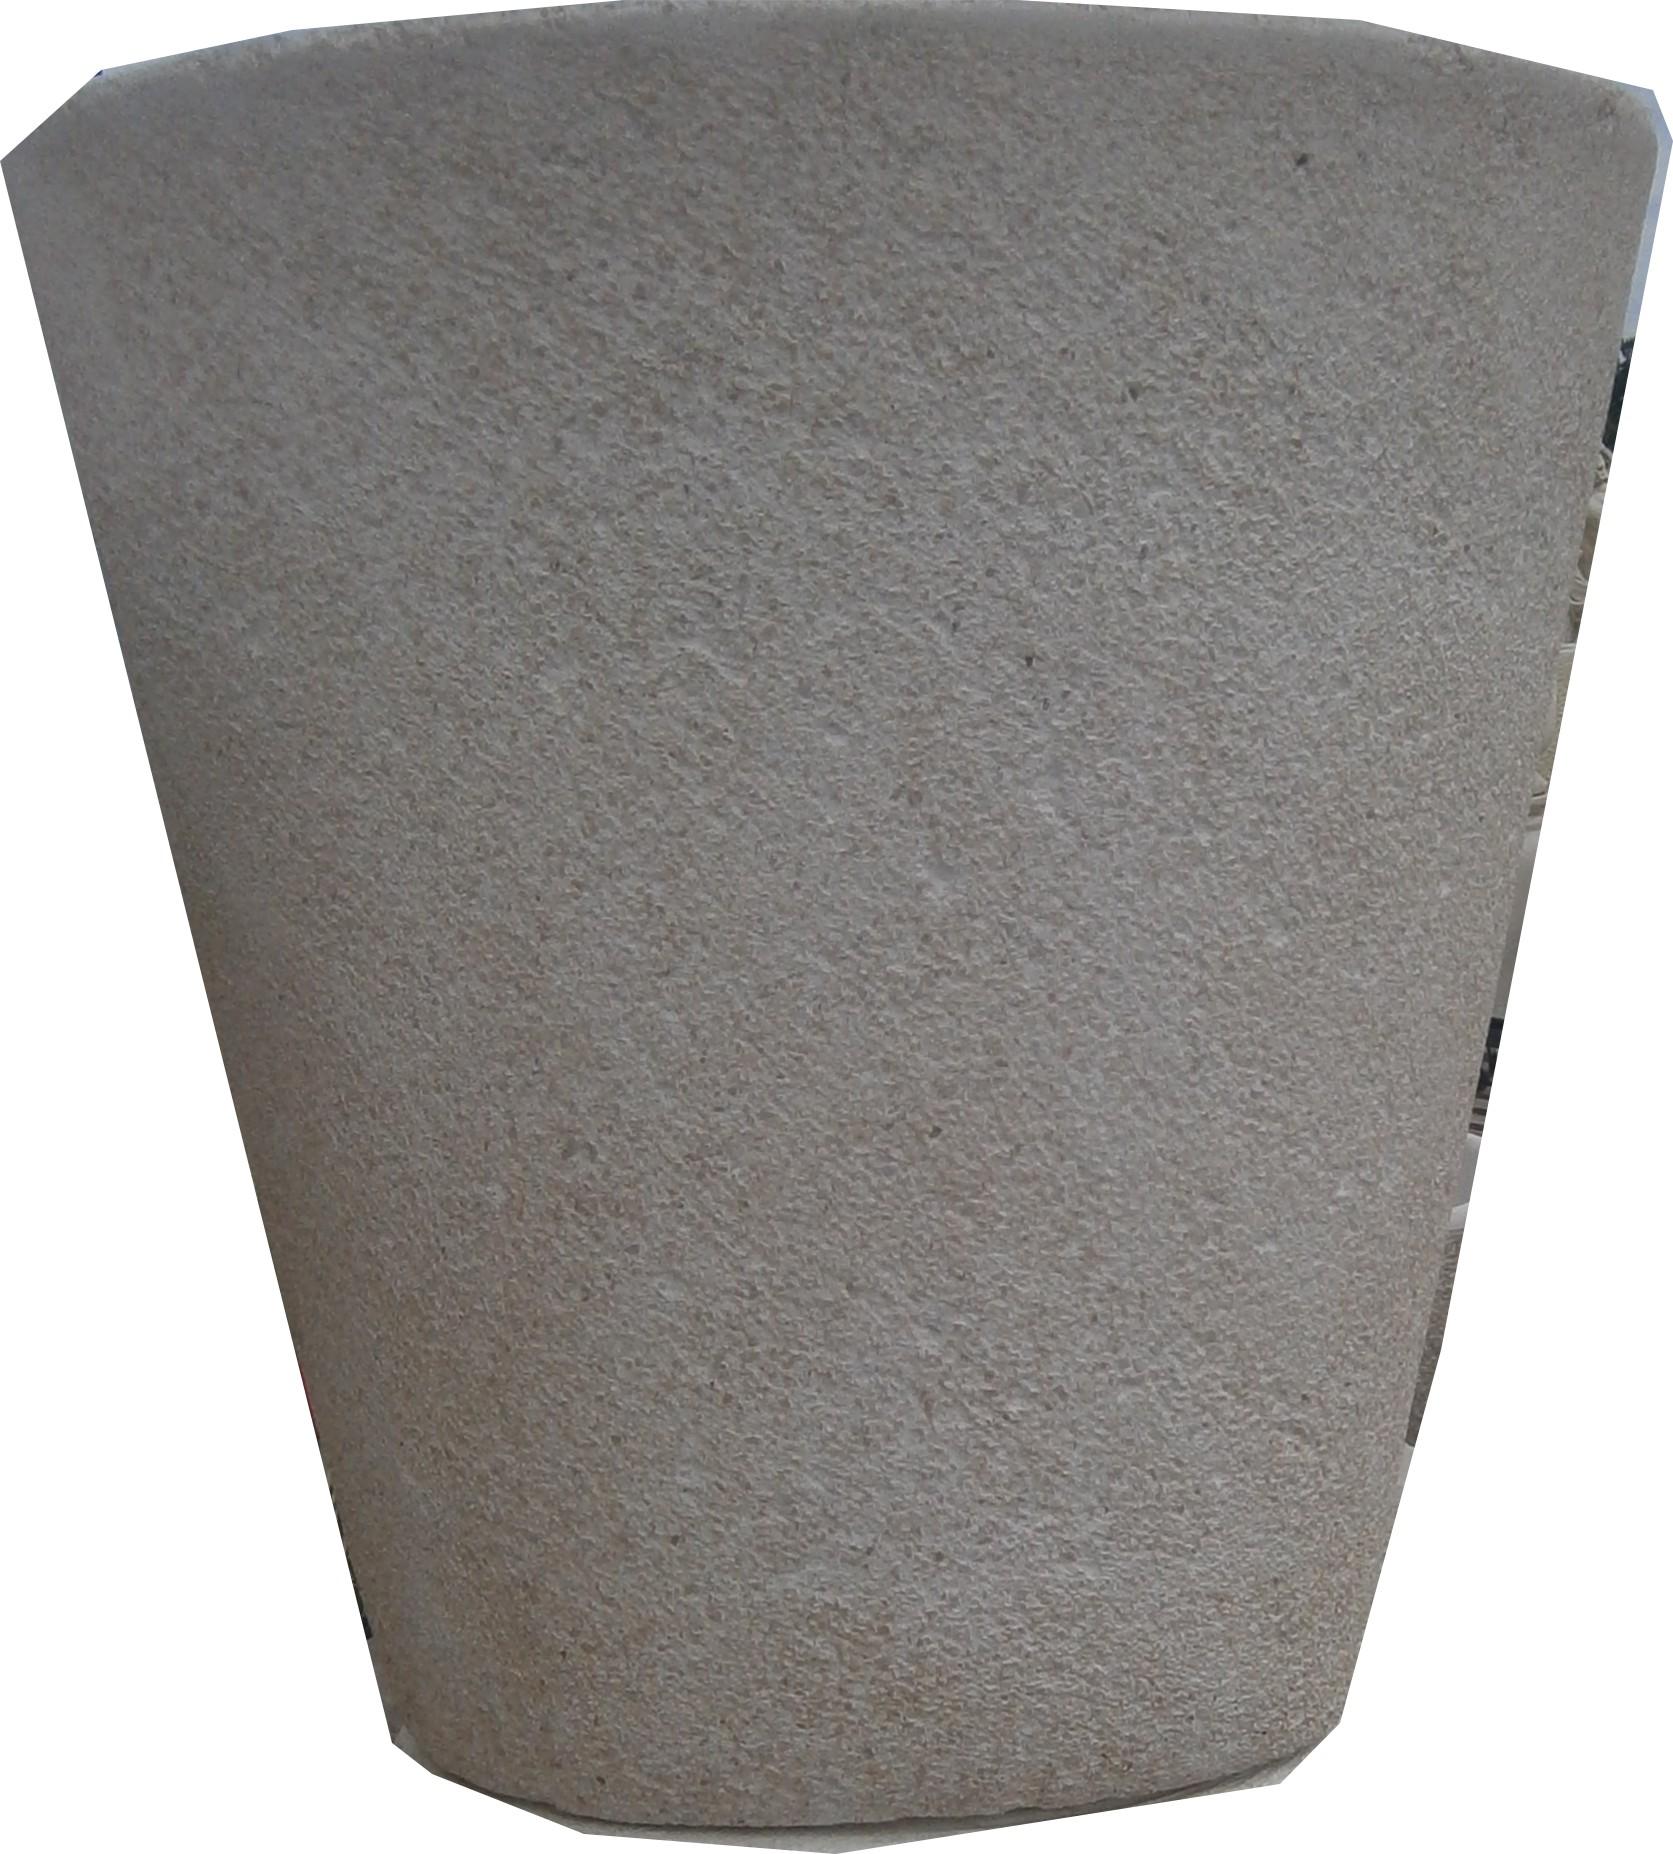 P5270524